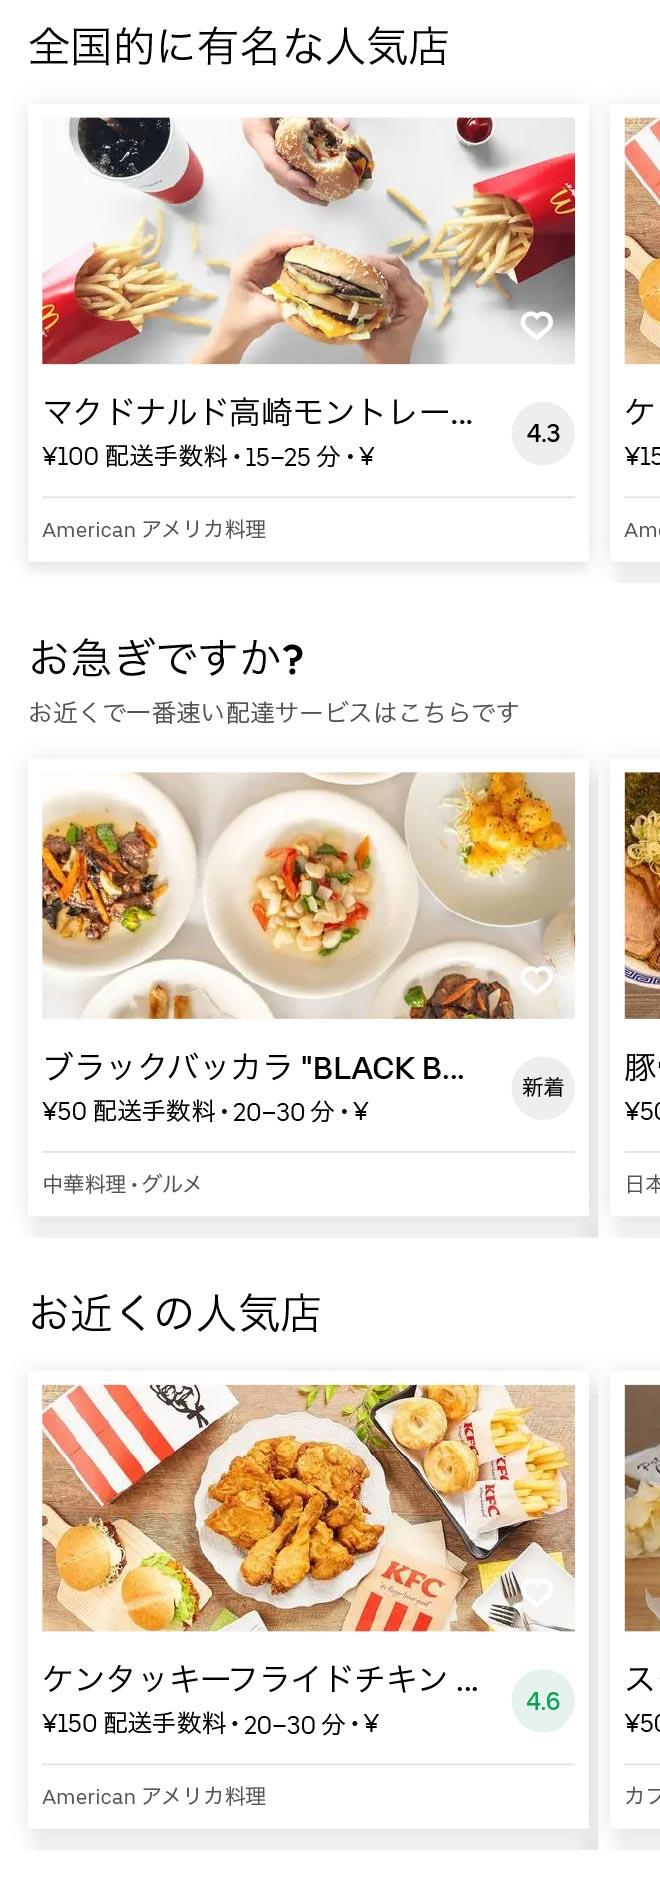 Takasaki menu 2010 01